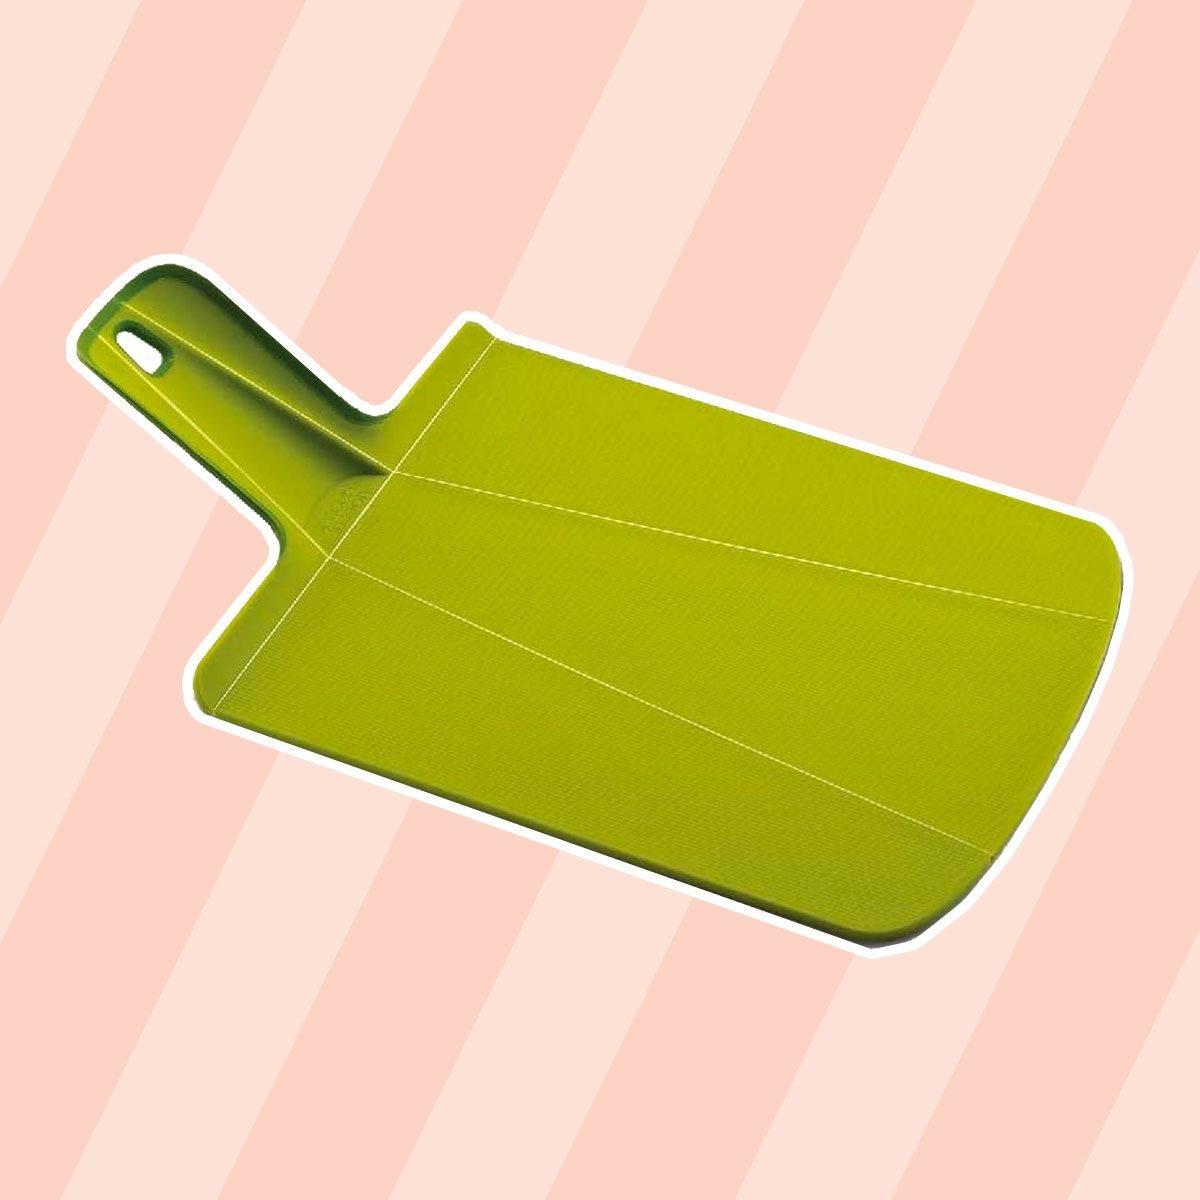 Joseph Joseph NSG016SW Chop2Pot Foldable Plastic Cutting Board 15-inch x 8.75-inch, Small, Green